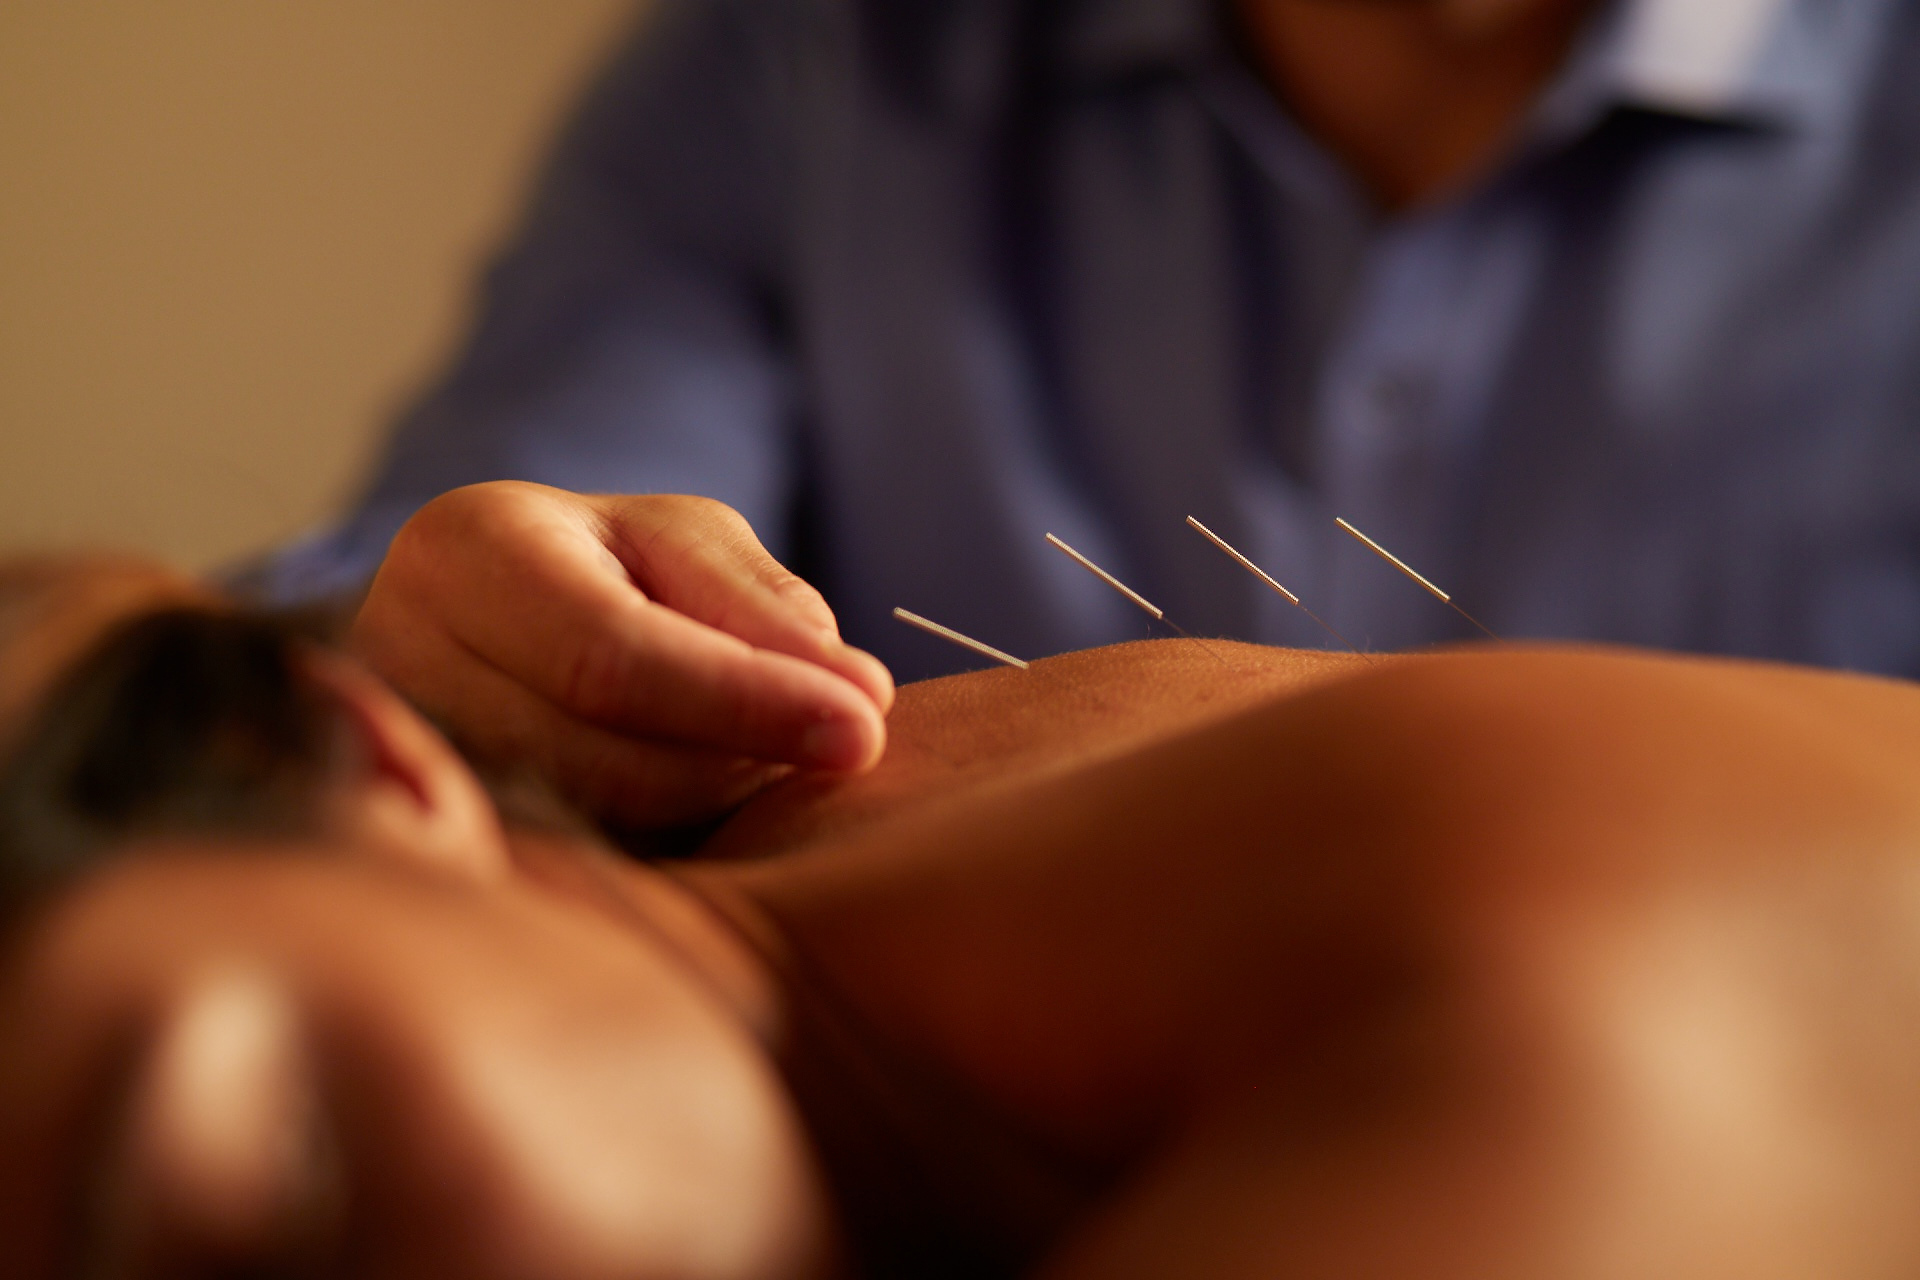 Acupuncture Benefits - Increased EnergyReduced StressImproved SleepRelaxationIncreased VitalityImproved Immunity